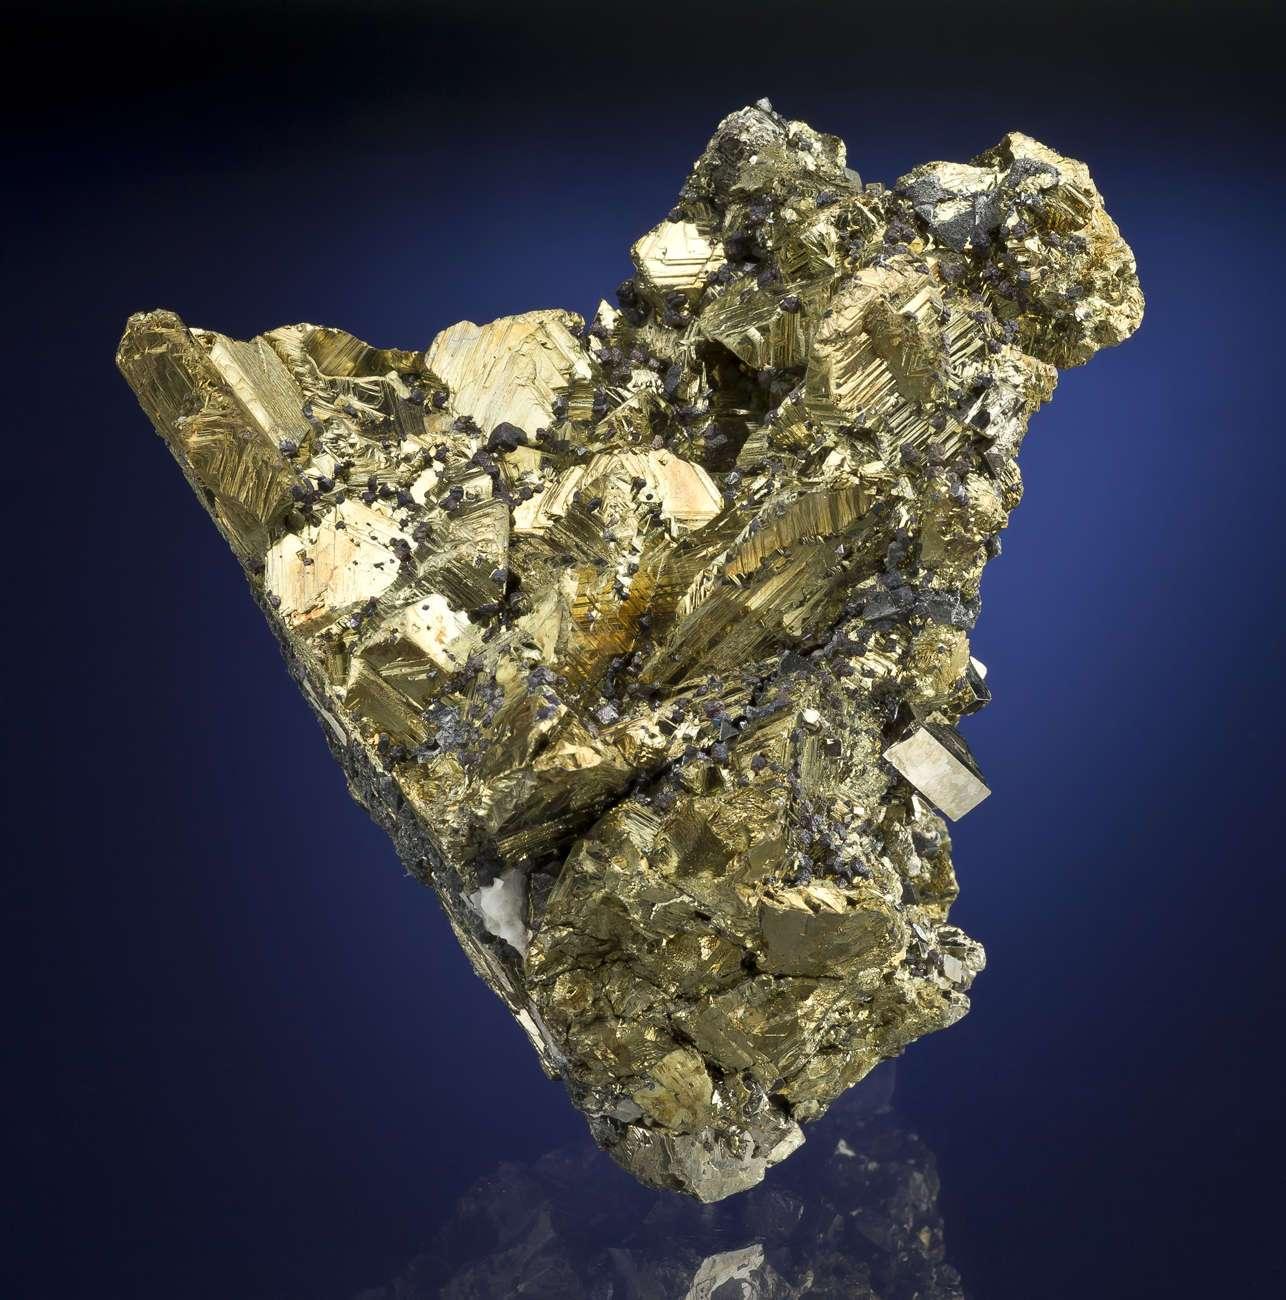 This specimen metallic golden brightness looks manmade brighter